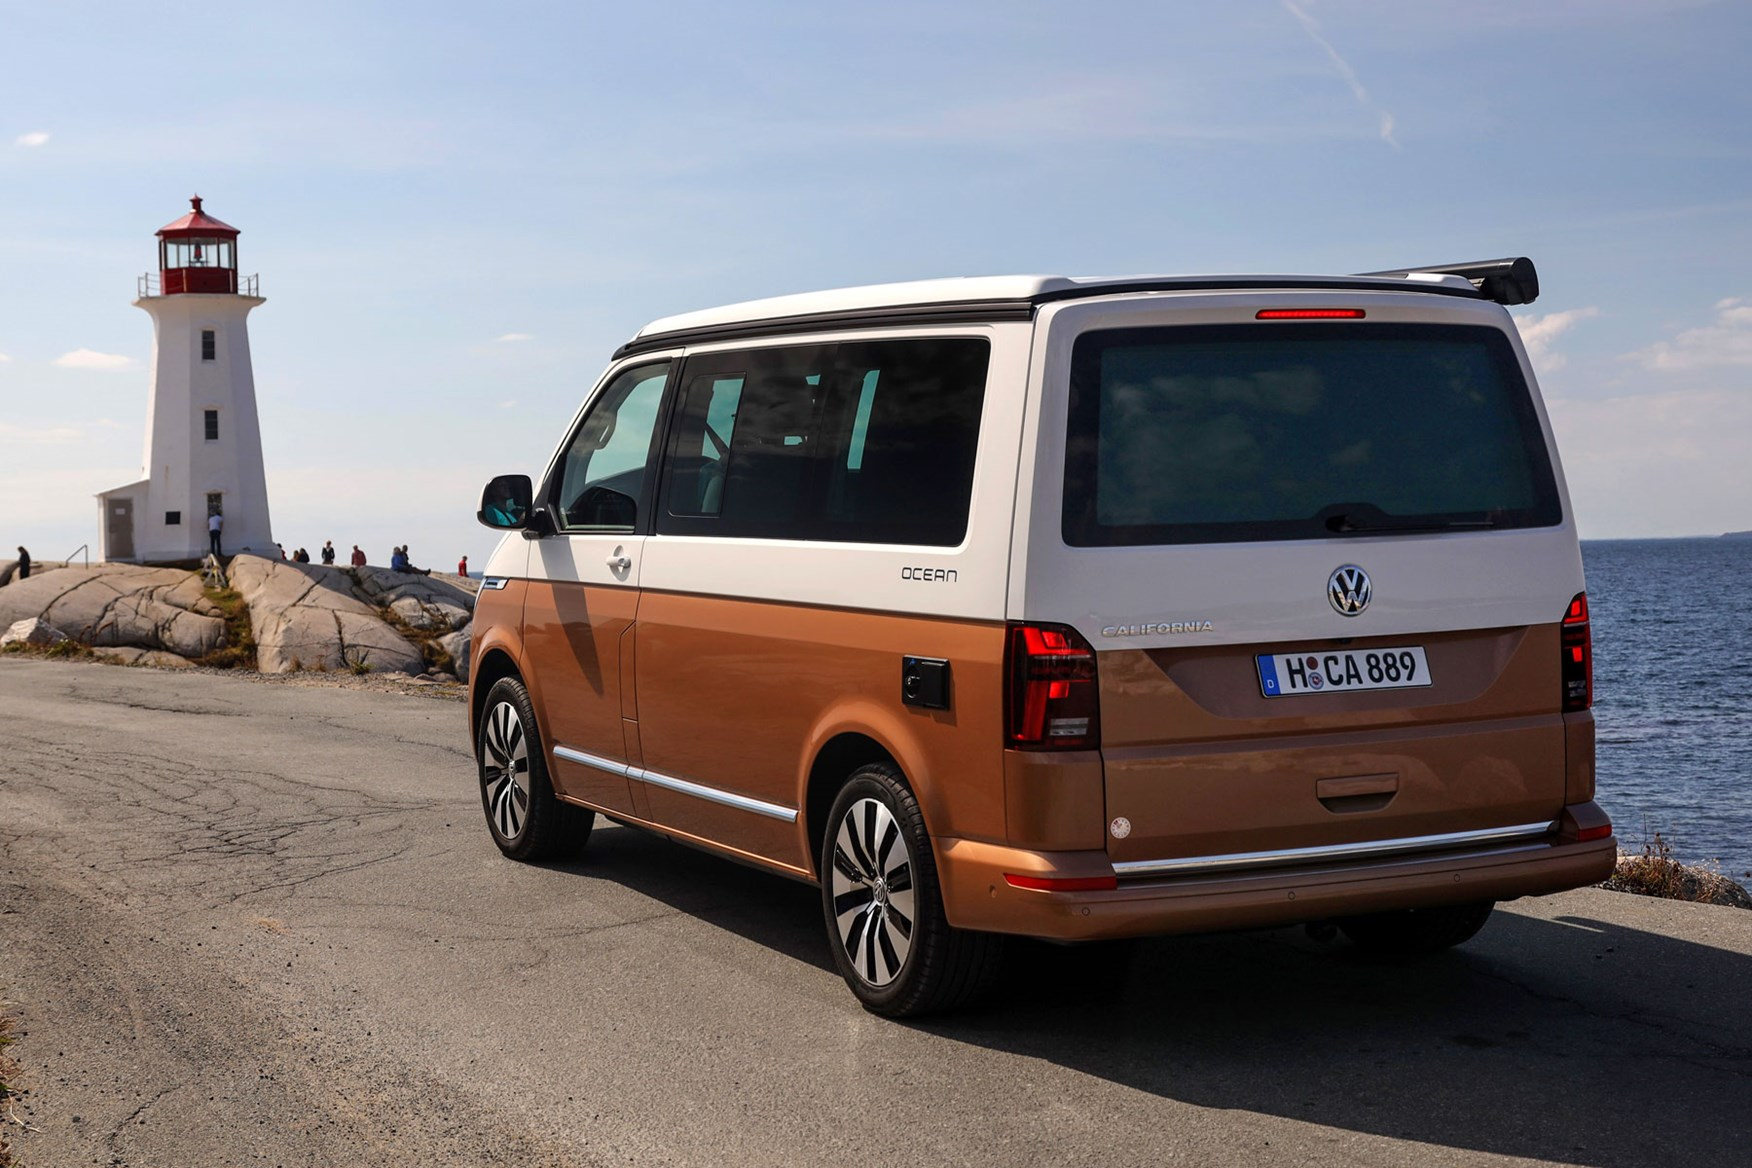 GENUINE VW VOLKSWAGEN LONG ARM REAR VIEW MIRROR 2 TONE FITS VWFITS VW T5 T6